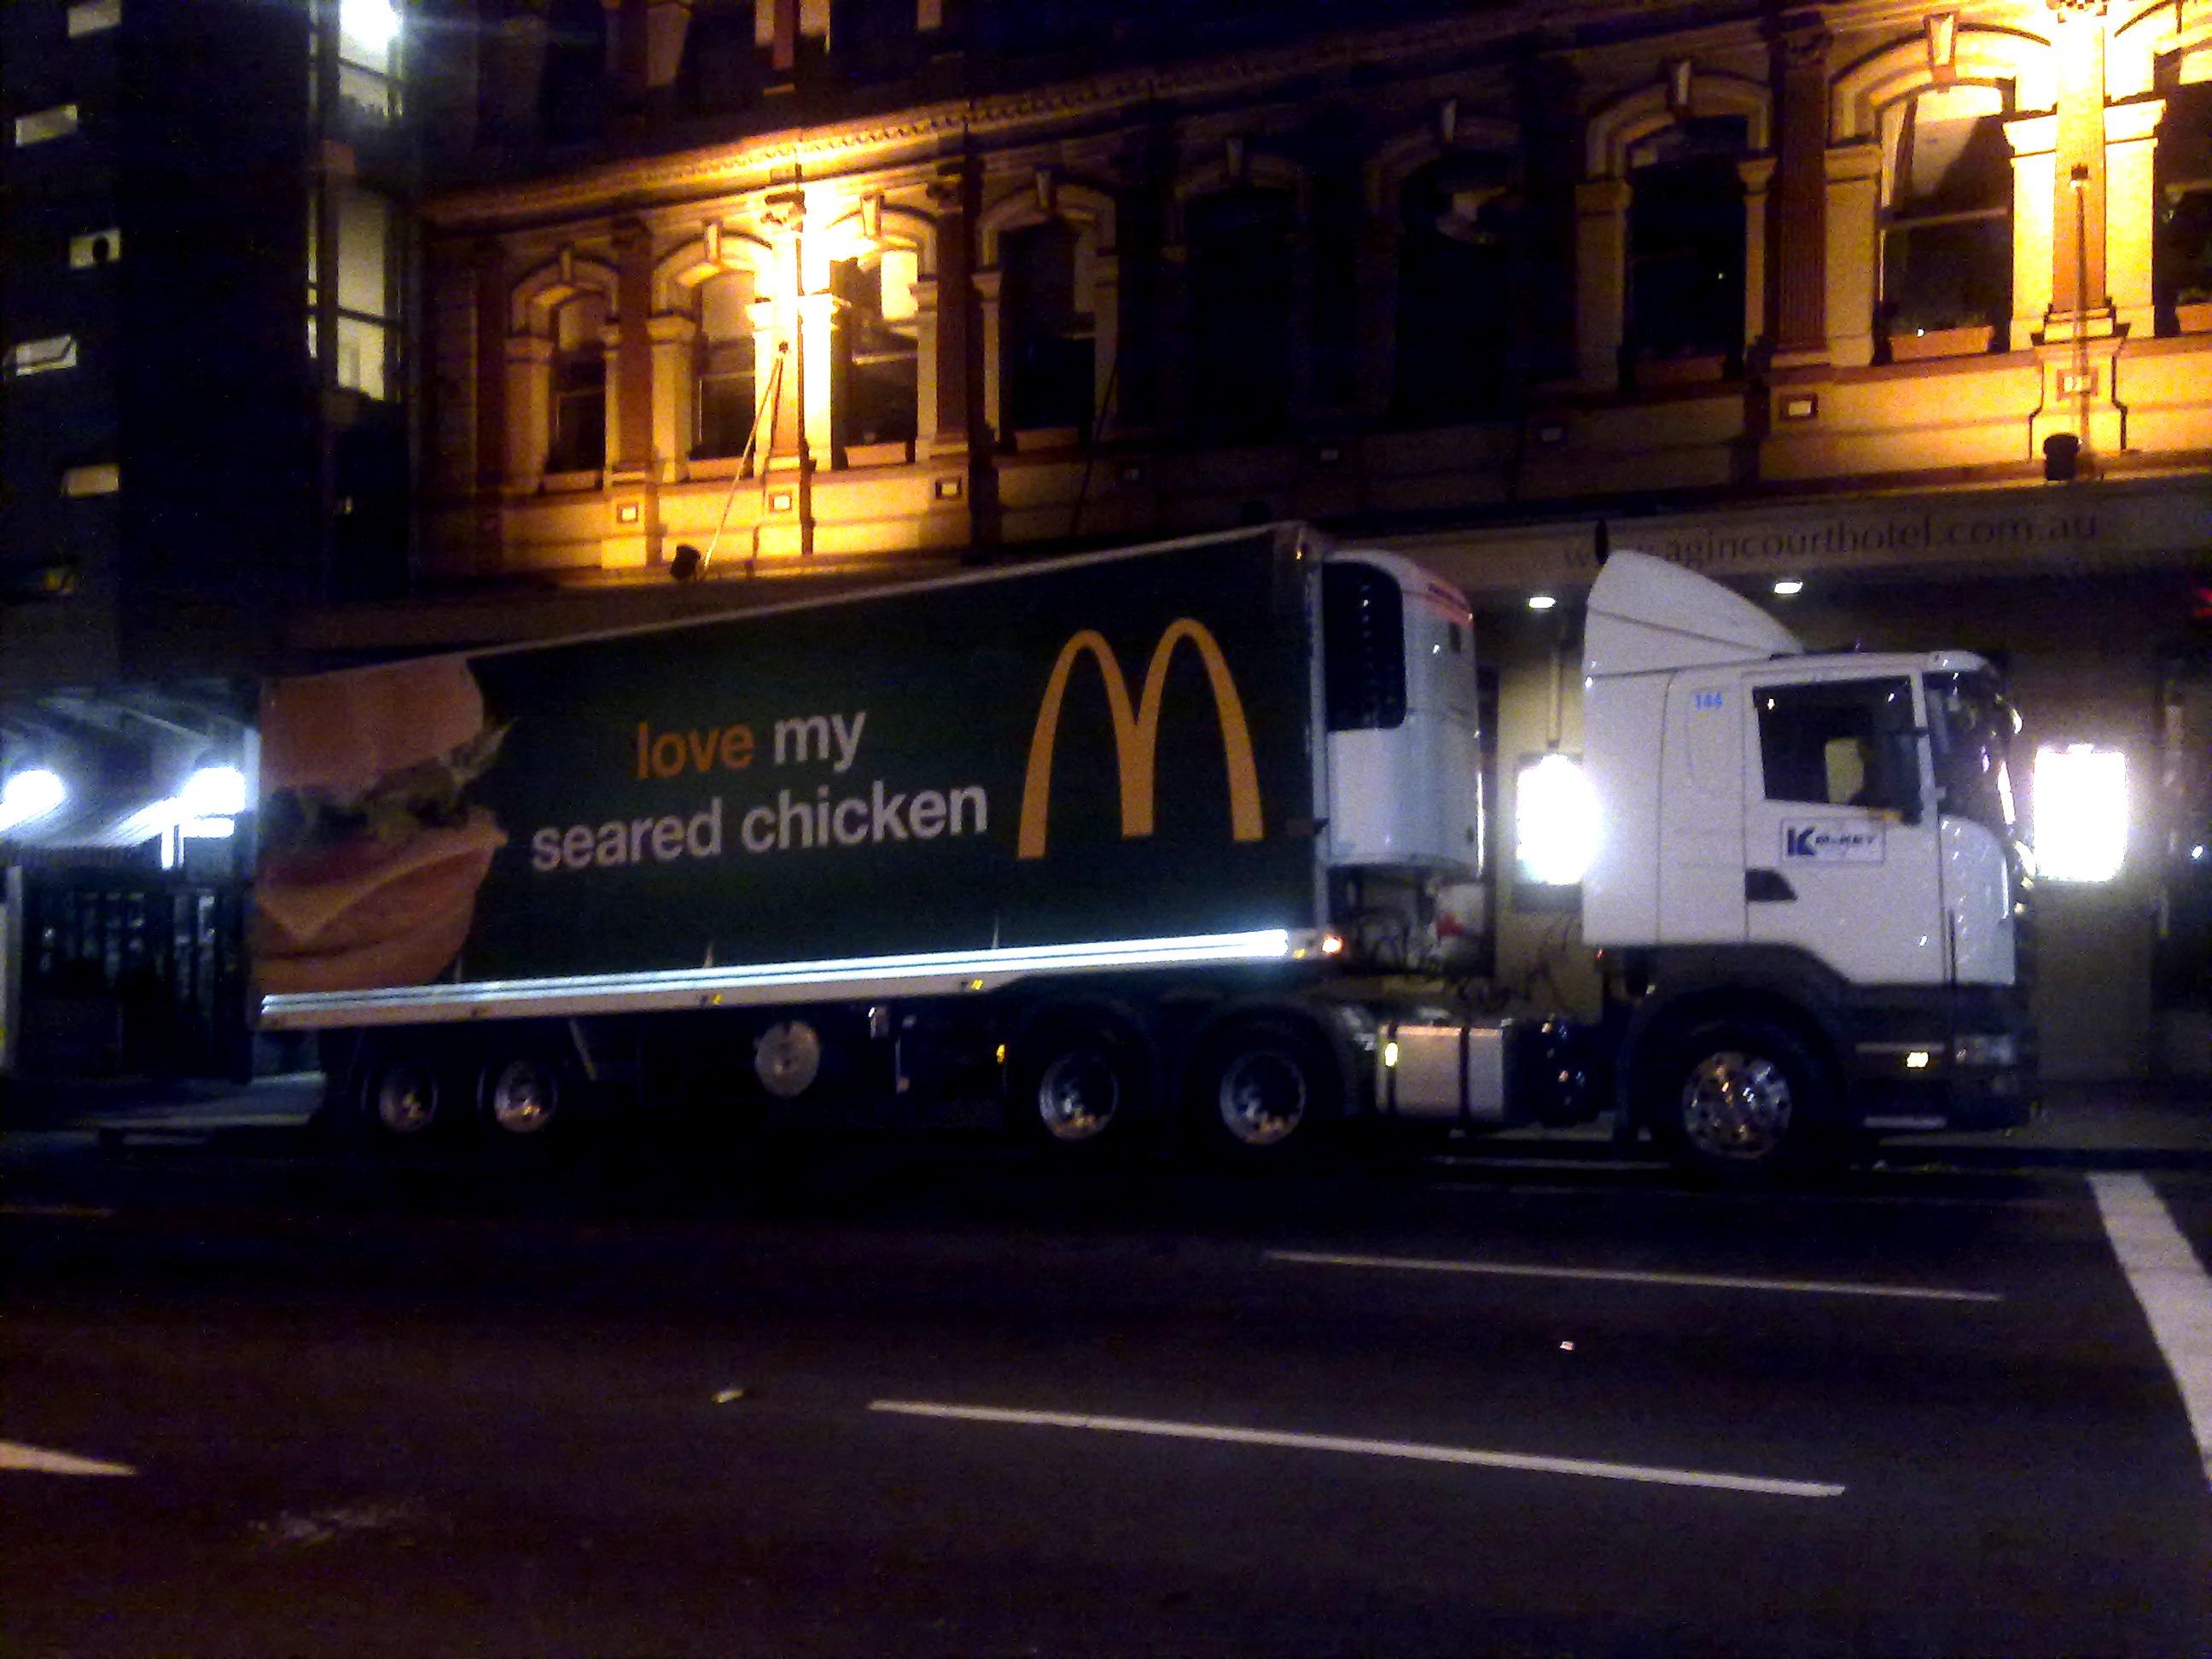 The McDonalds Truck